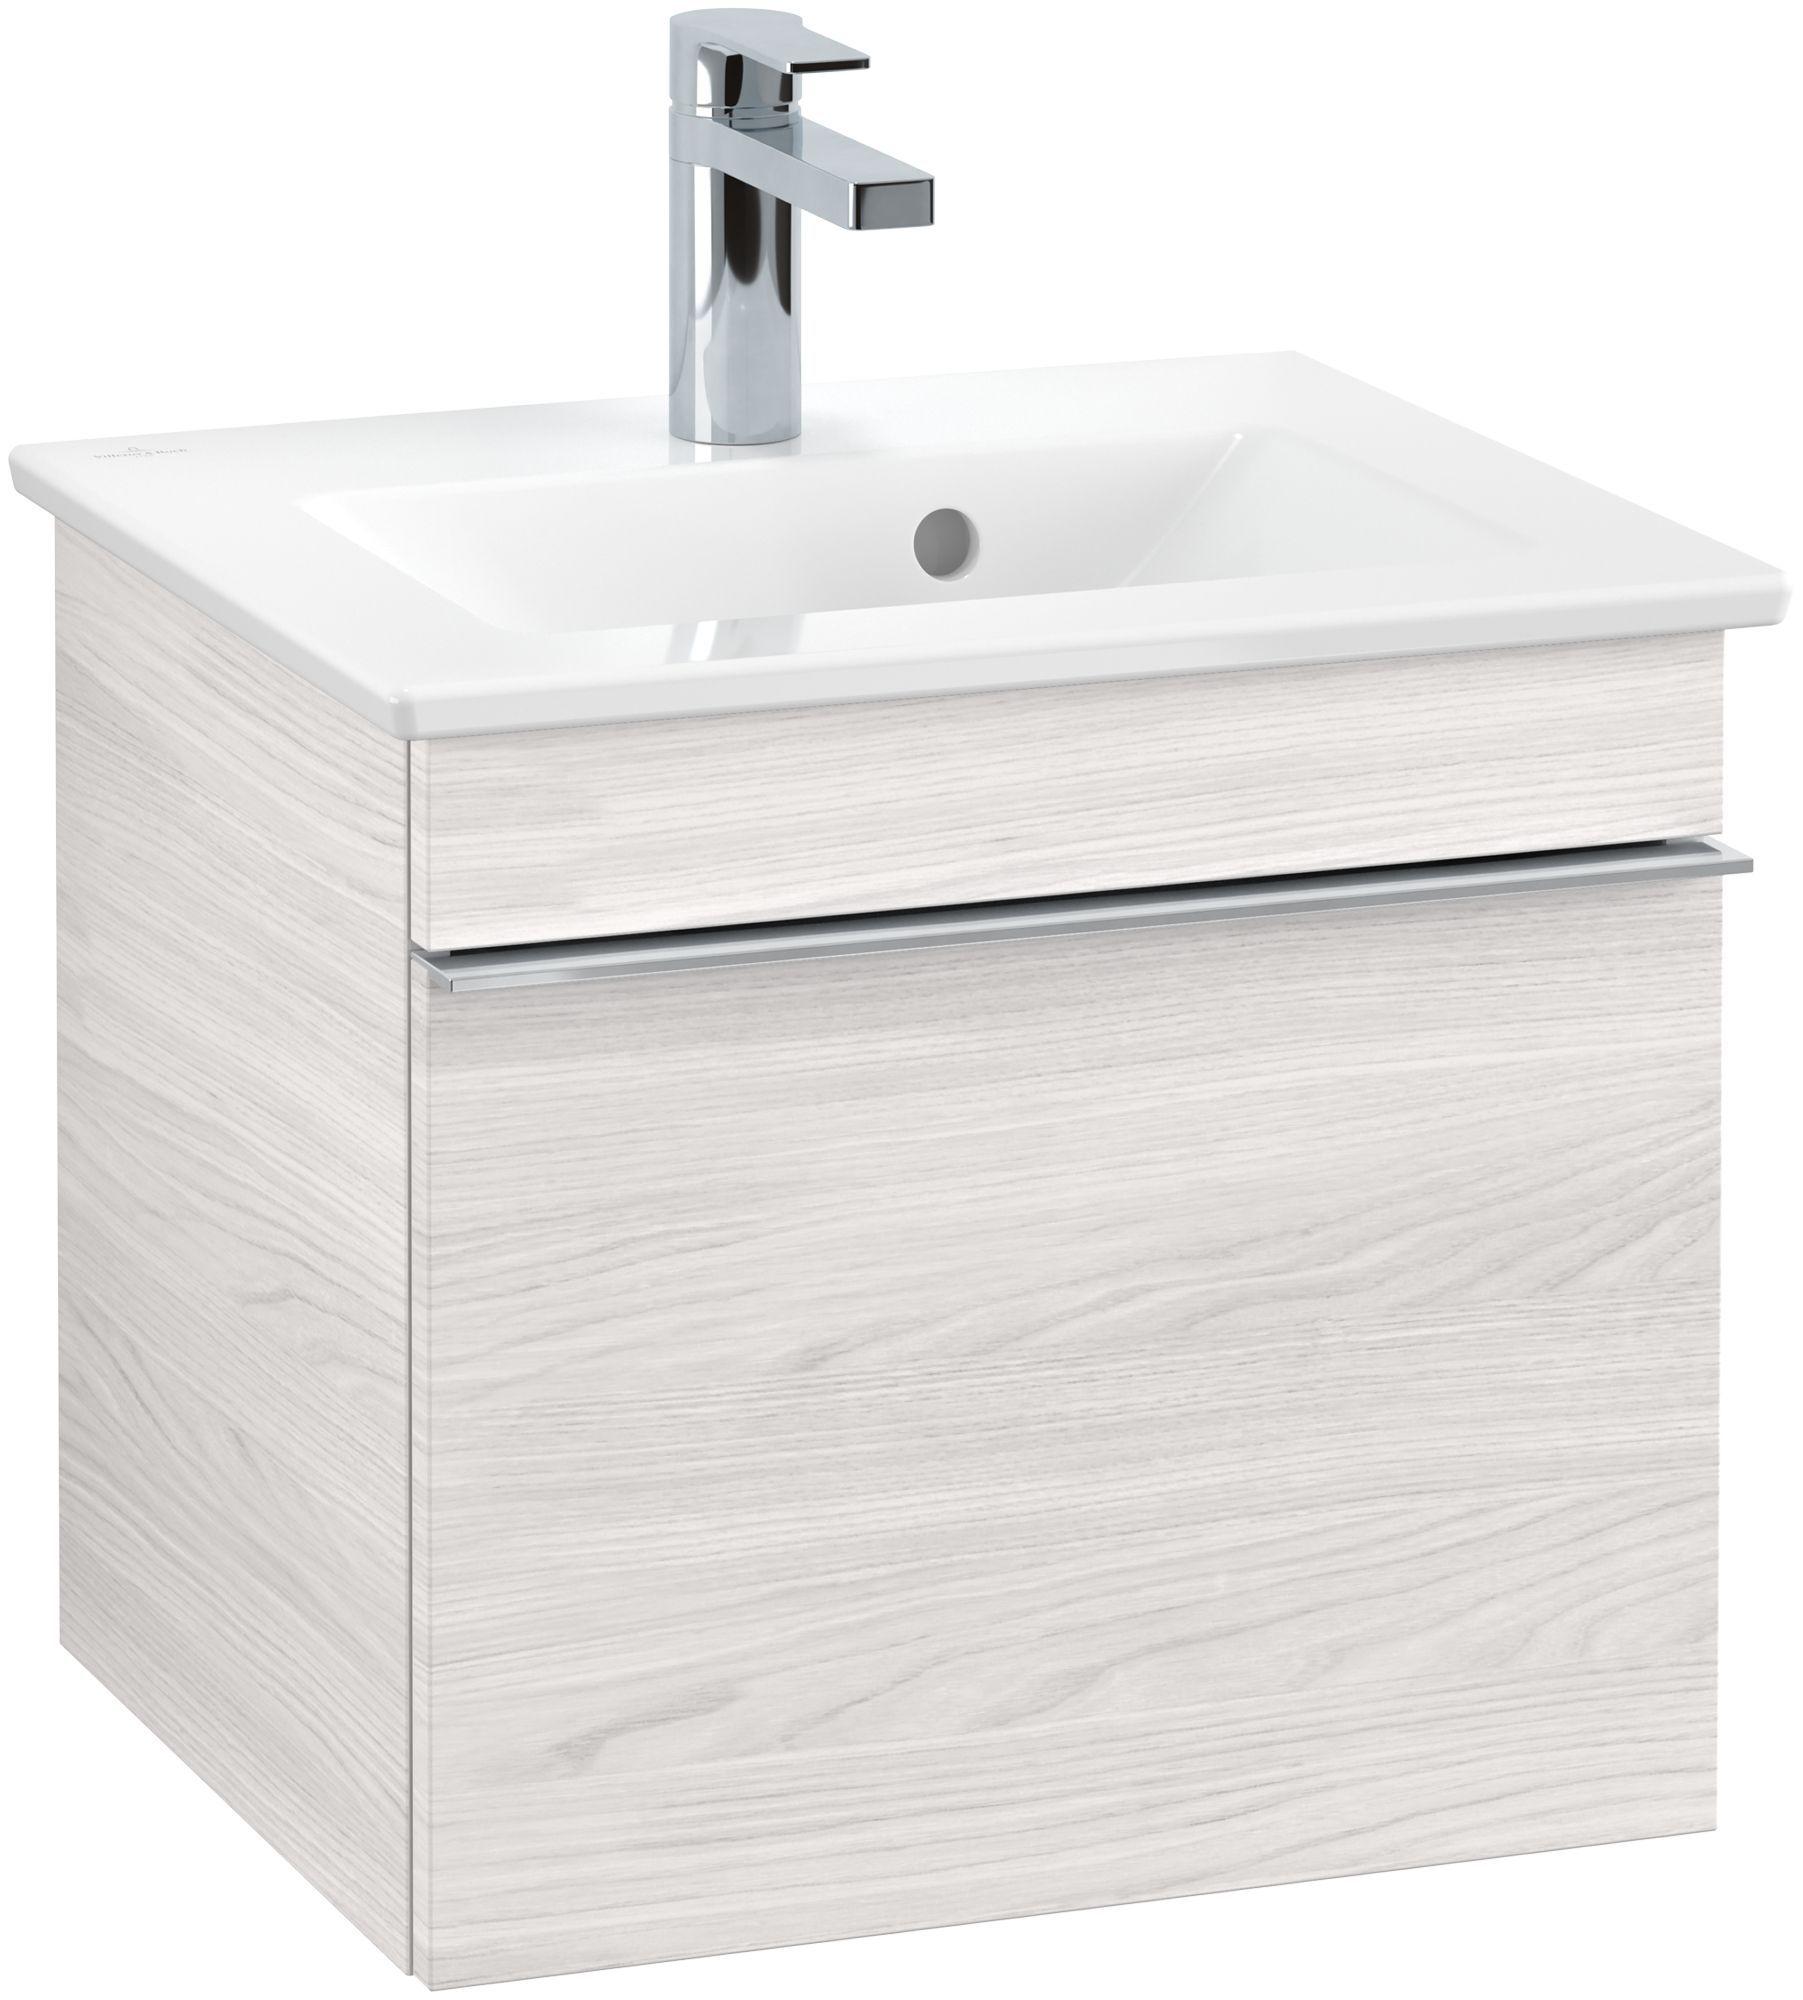 Villeroy & Boch Venticello Waschtischunterschrank 1 Auszug B:46,6xH:42xT:42,6cm white wood Griffe chrom Griffe chrom A93101E8